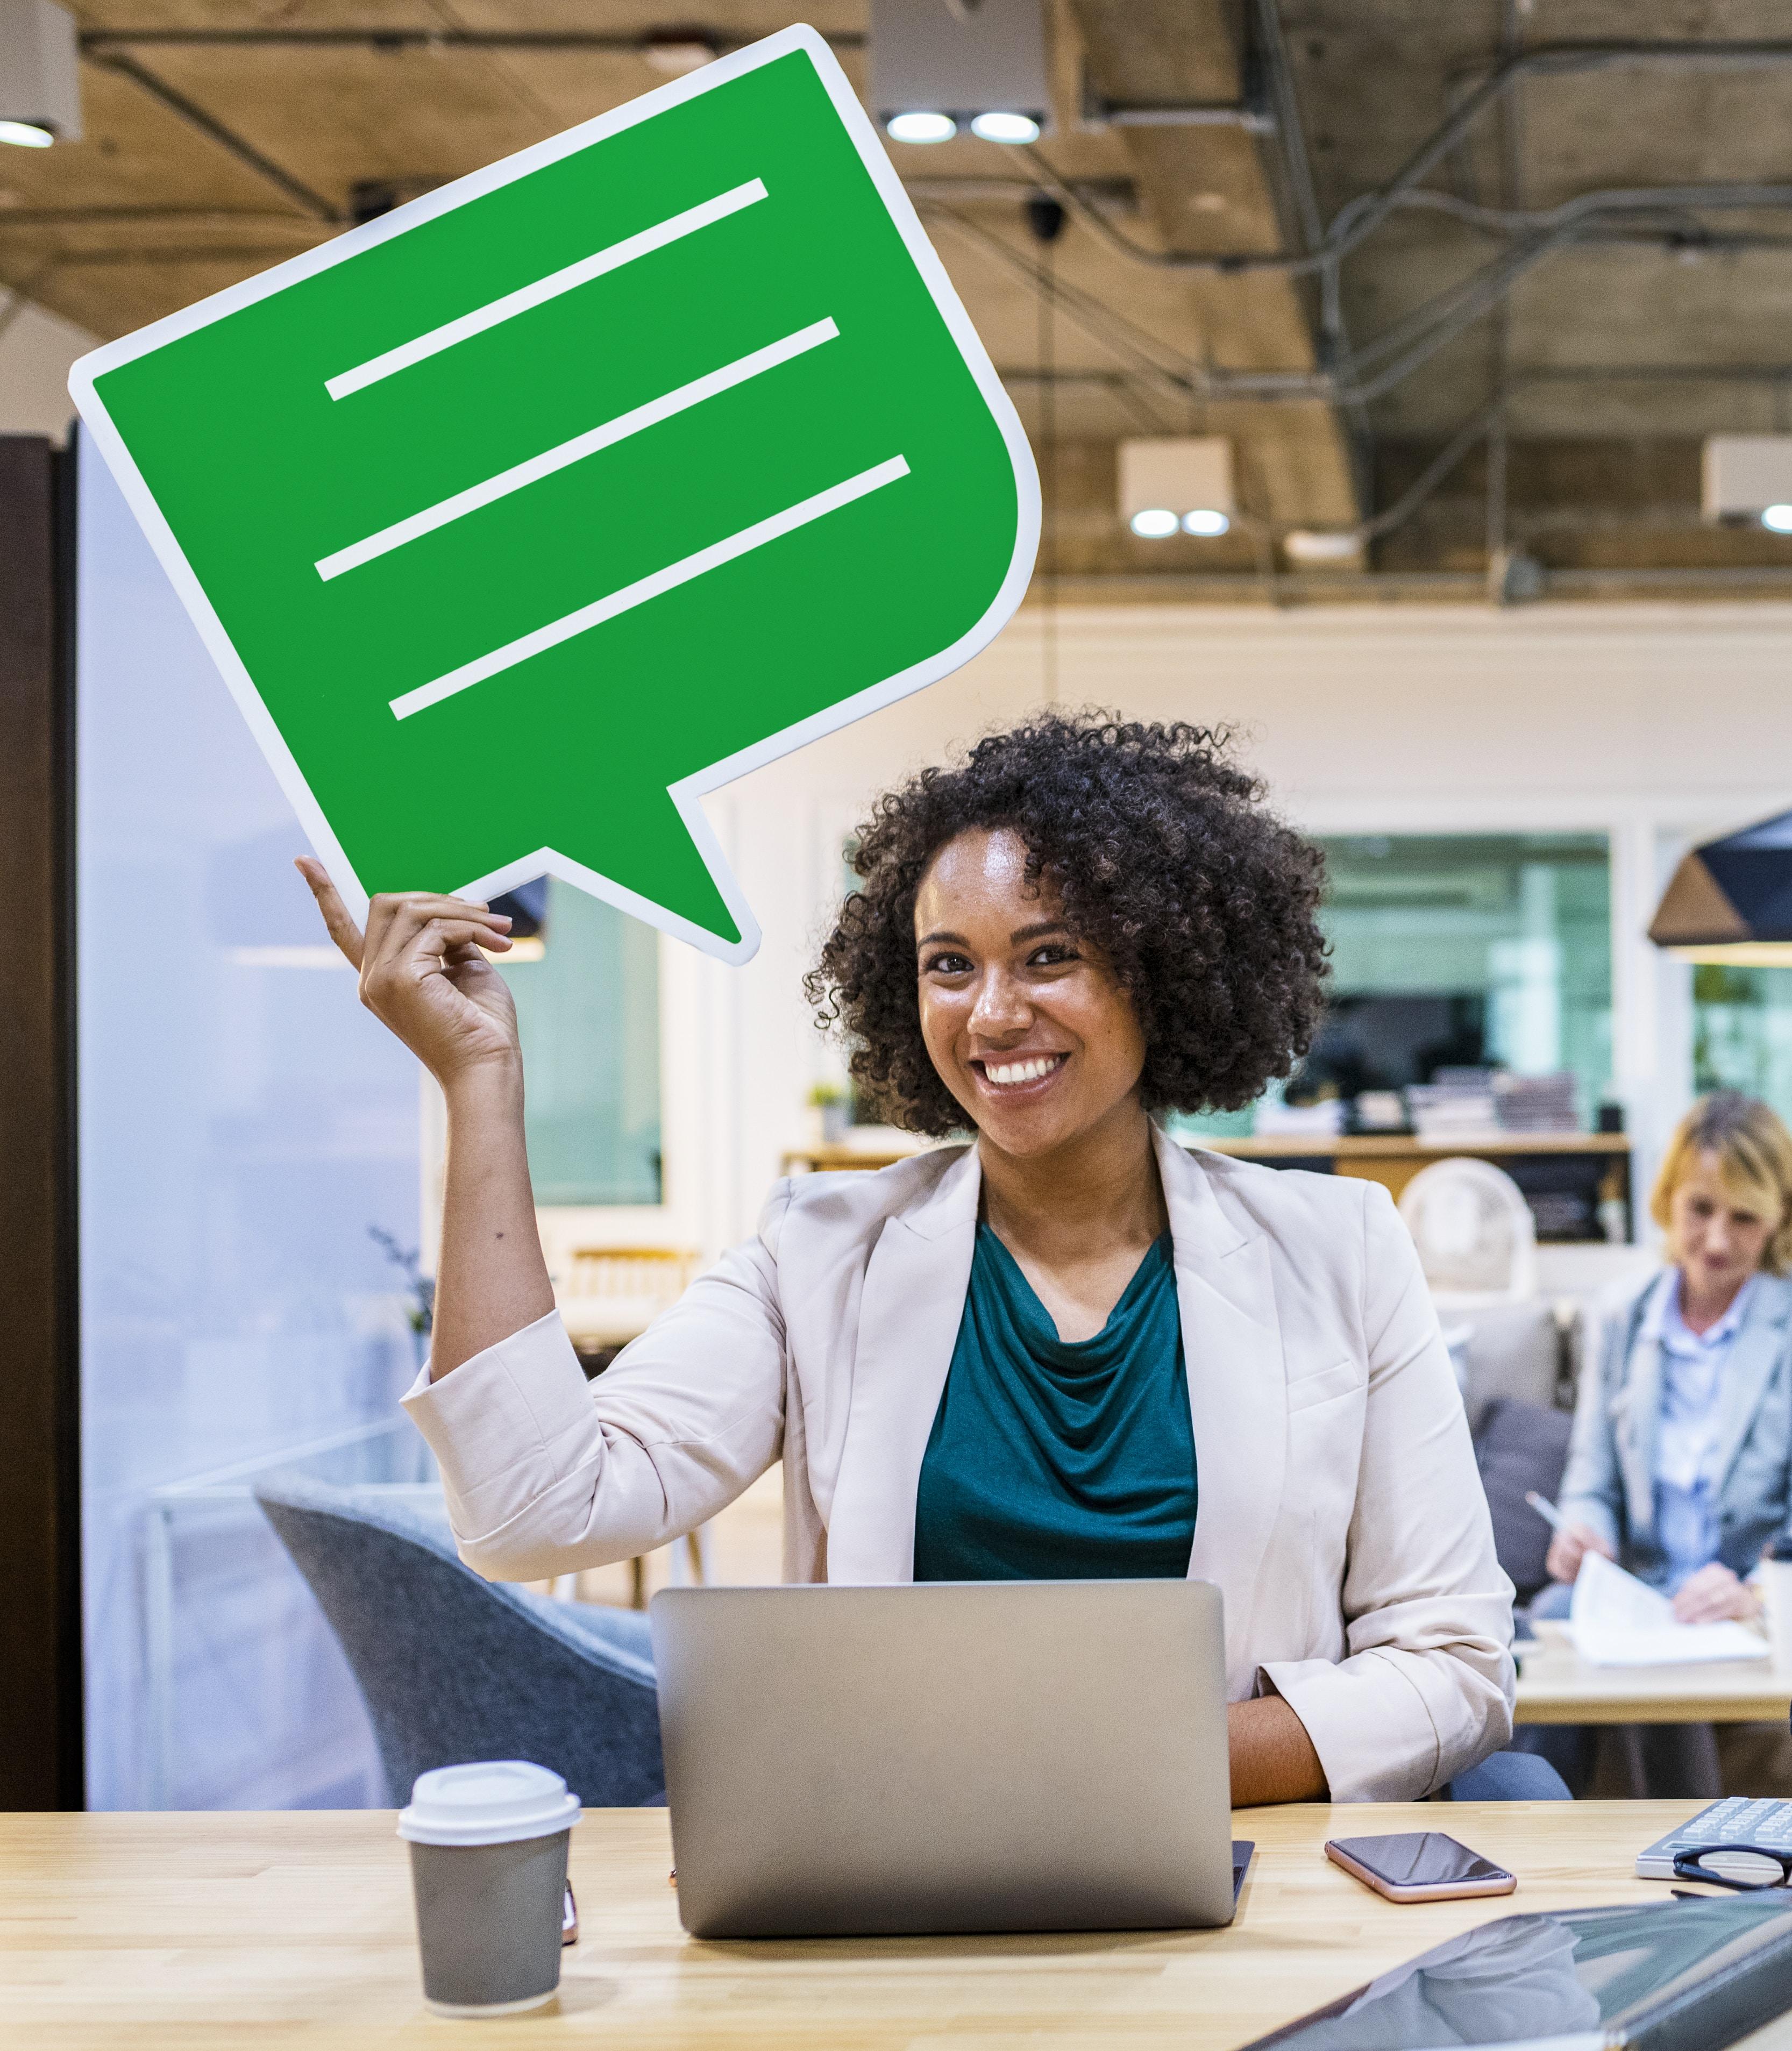 woman sitting holding green dialogue box